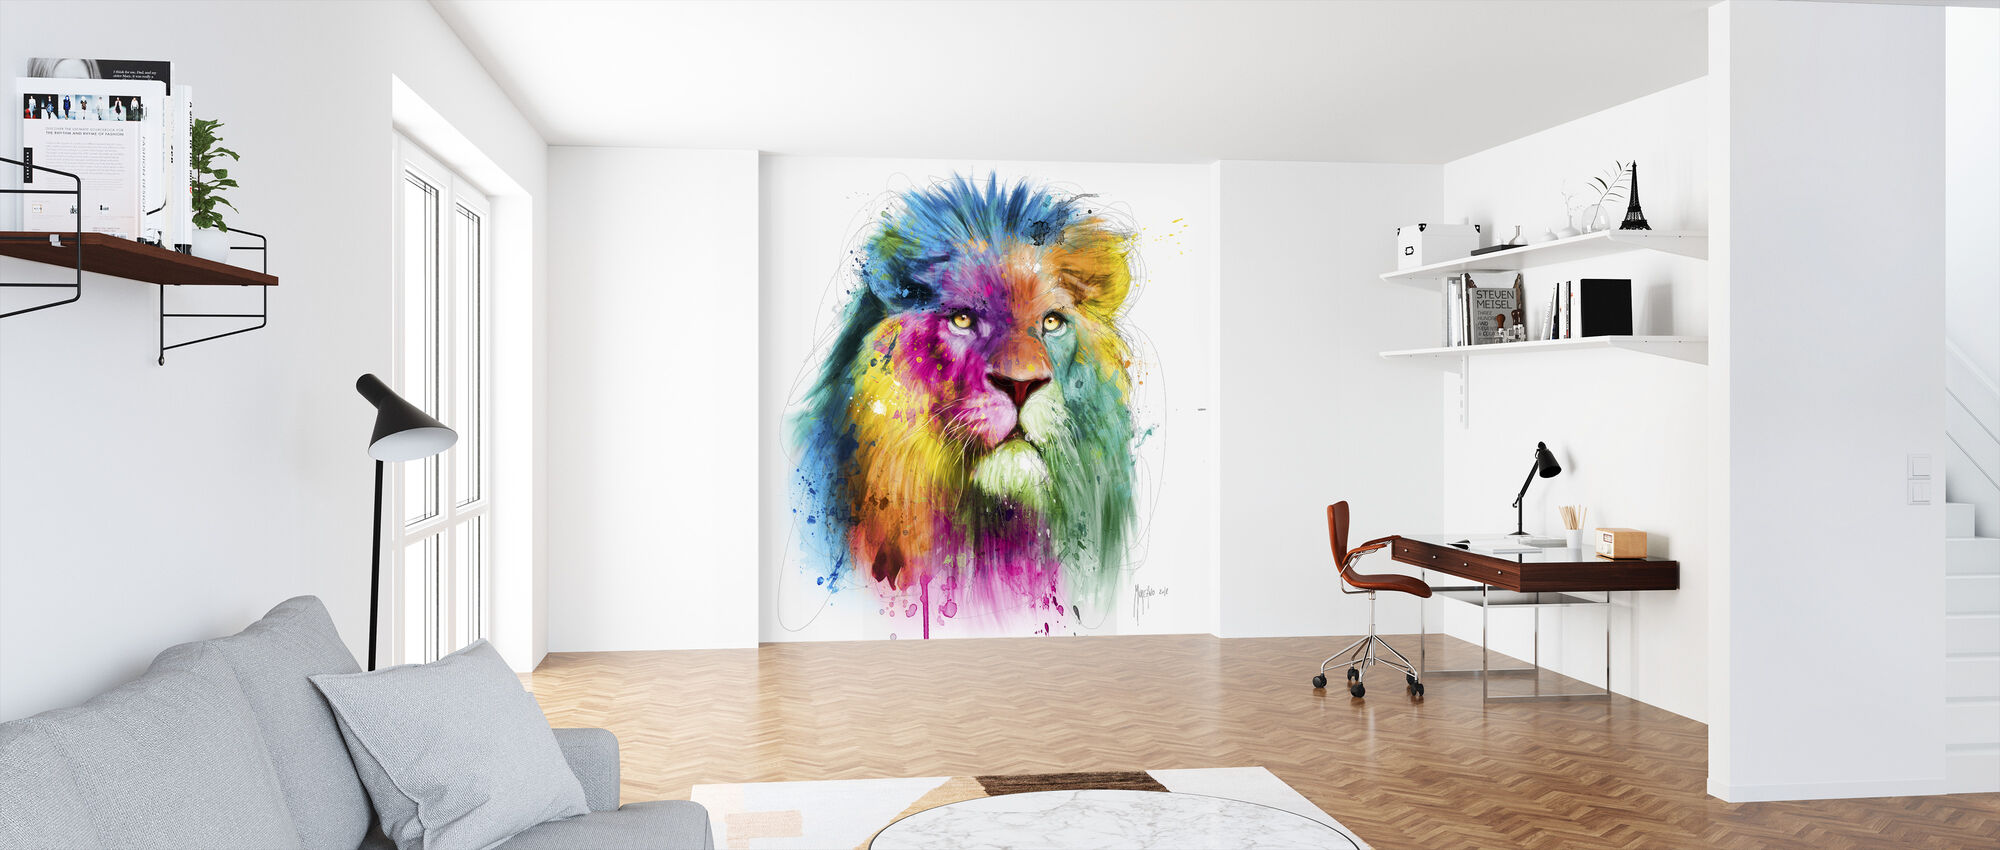 Lion - Wallpaper - Office